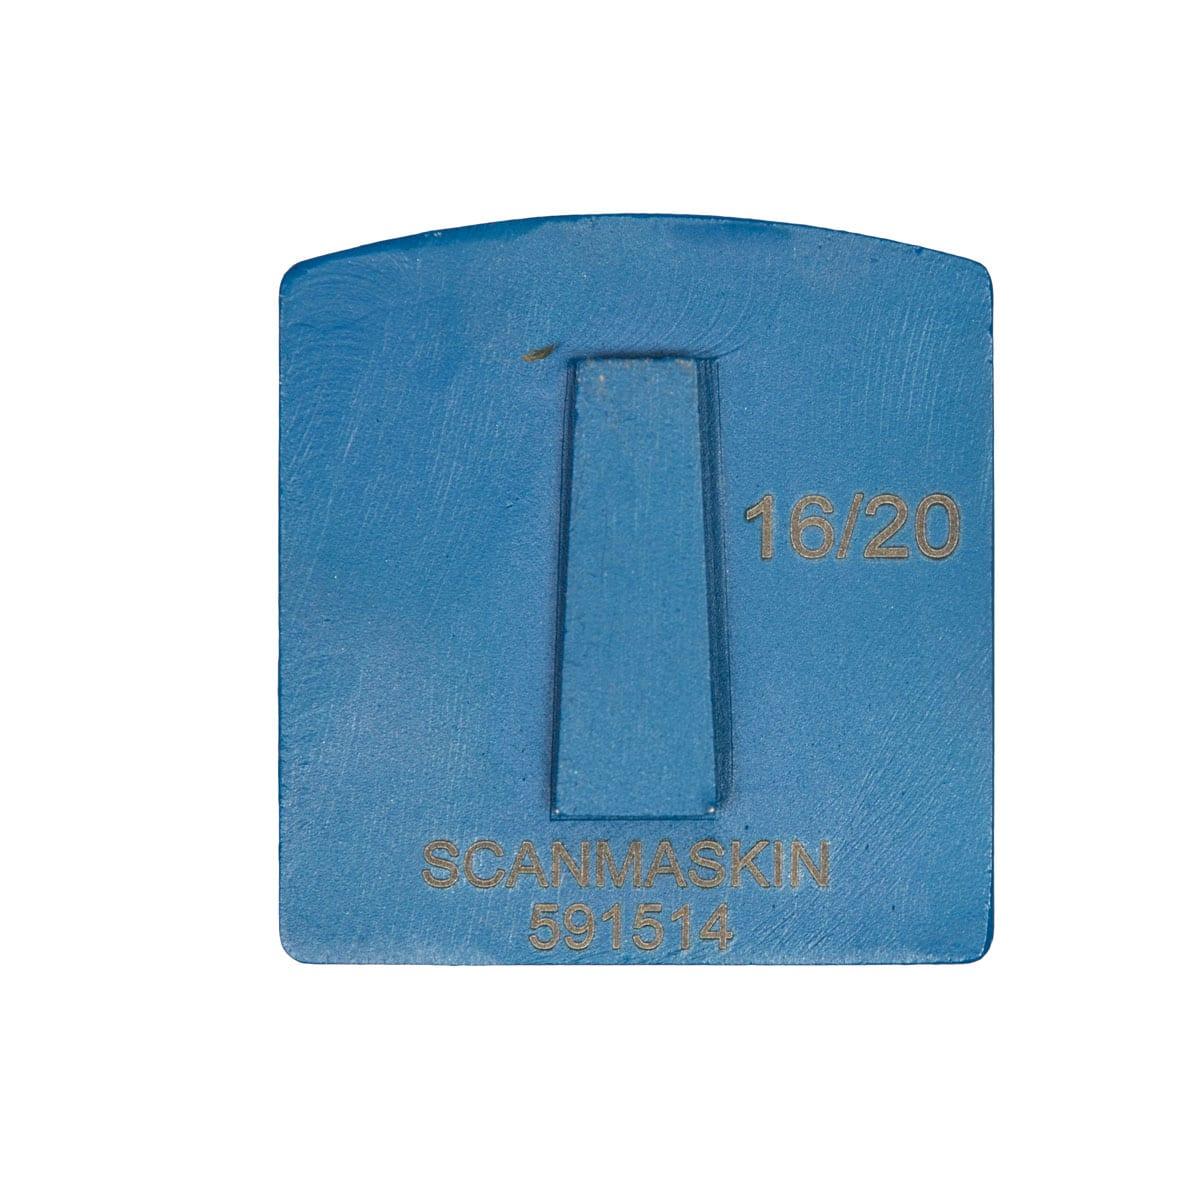 Back Medium Concrete Hardness 8 mm - 12mm Concrete Diamond Tool Blue Double #16/20 | #30/40 | #60/80 | #140/150 by Scanmaskin